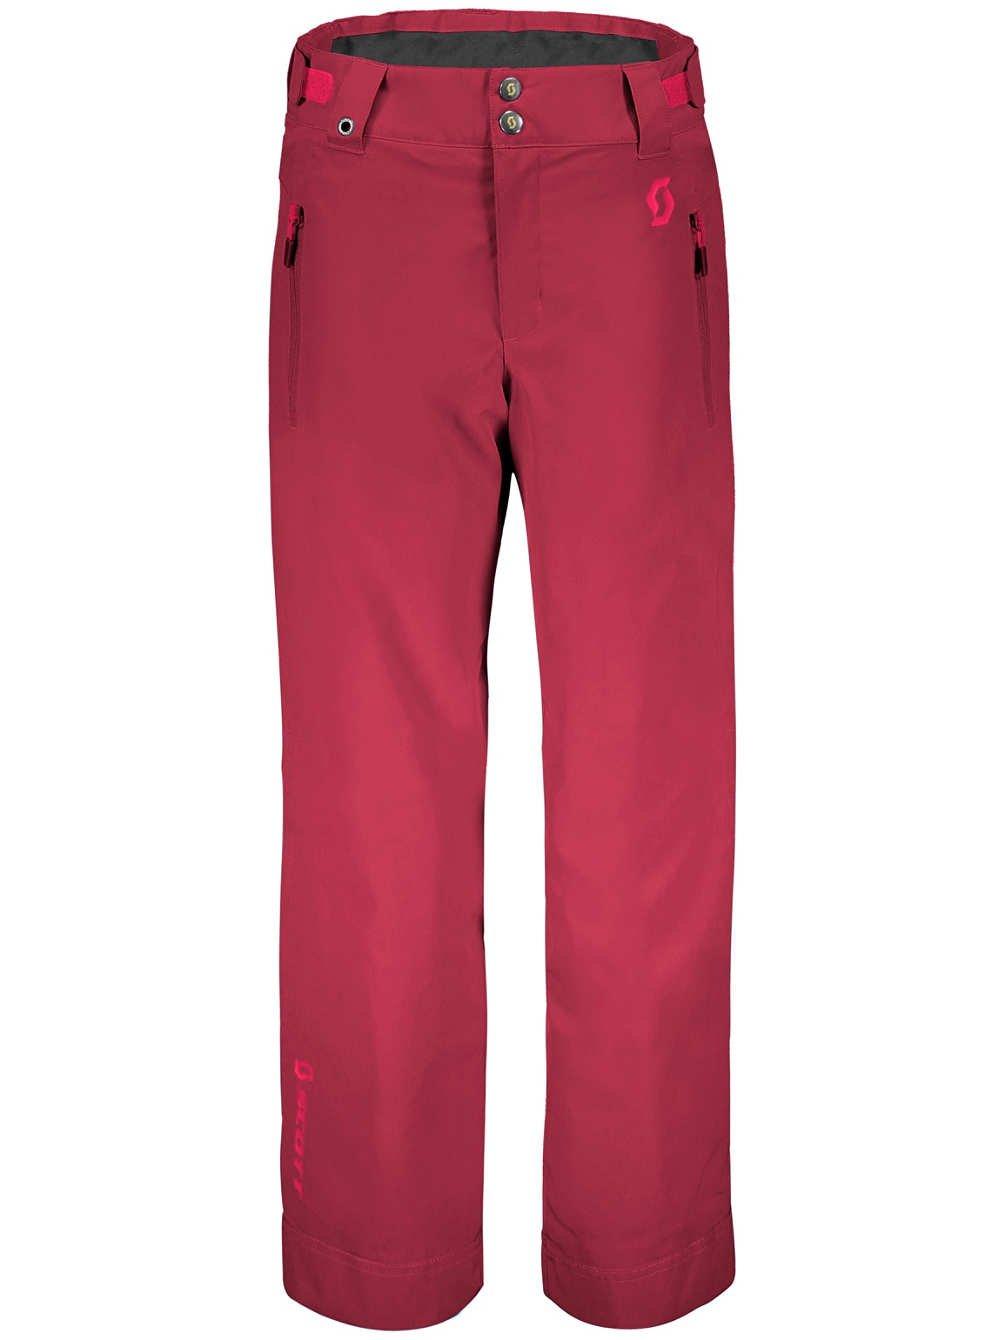 Mahogany rouge XL Scott Pantalon de ski pour enfant Jr Ultimate dryo 10